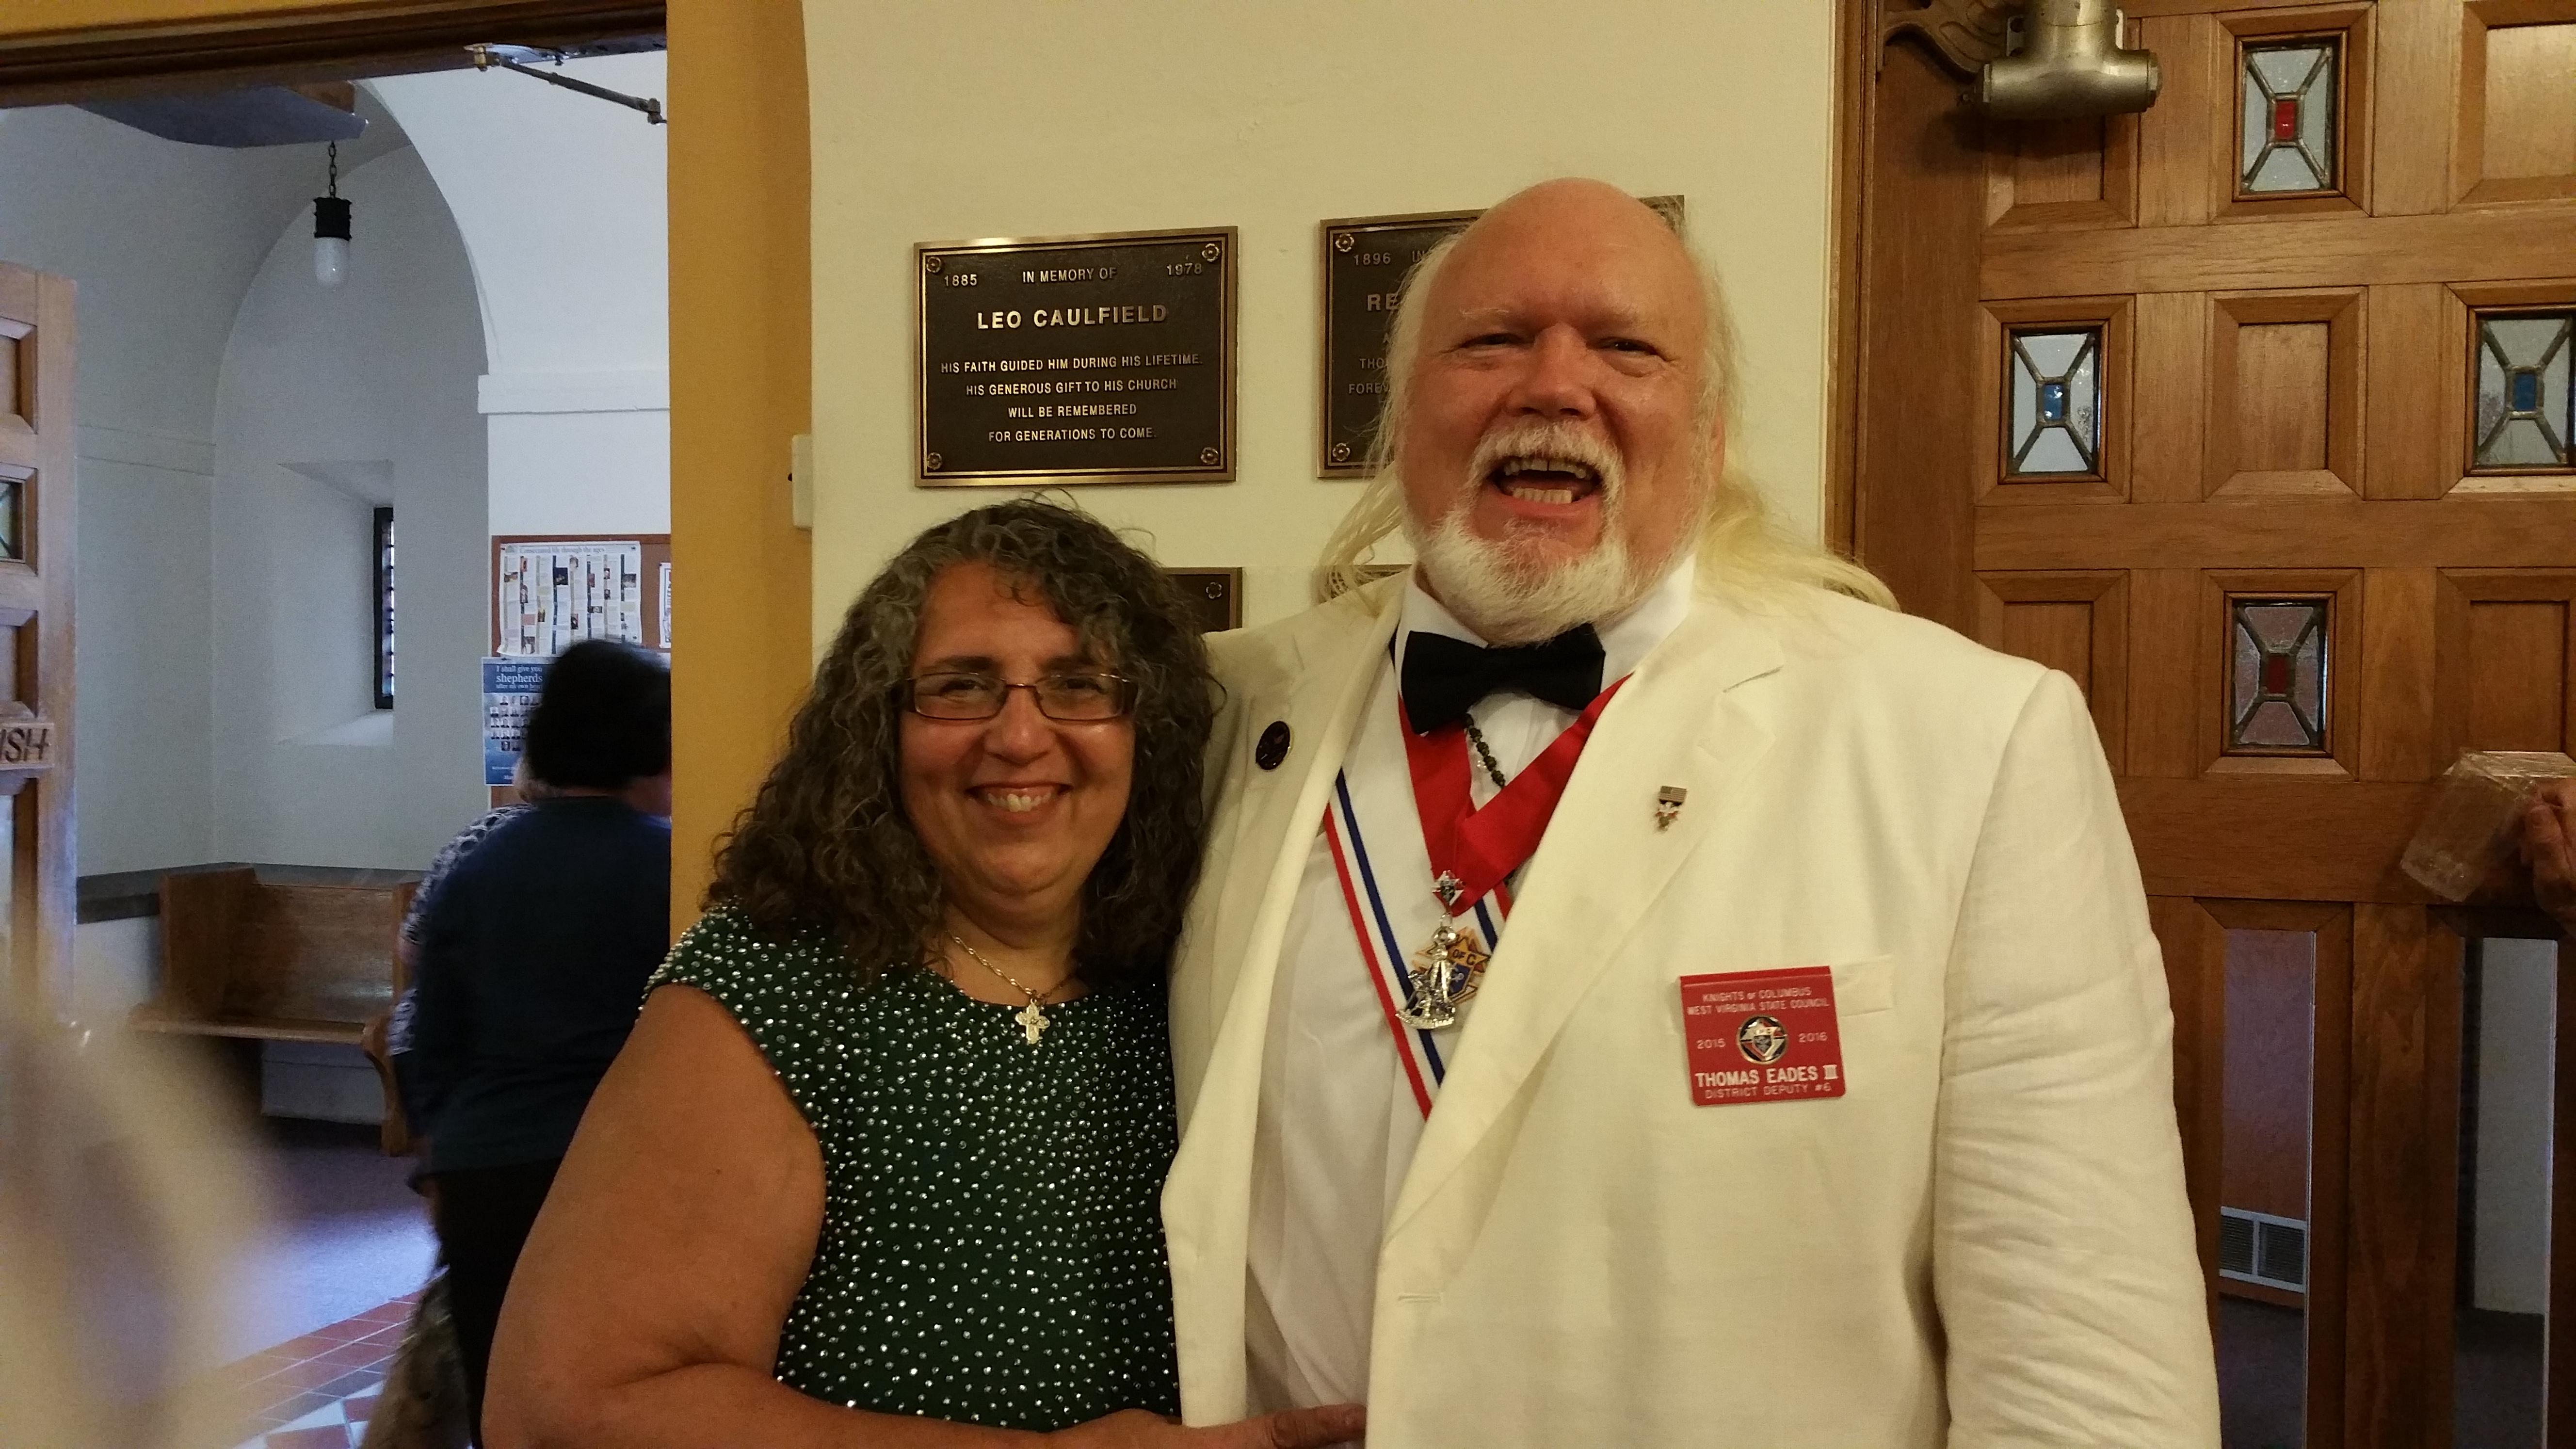 Tom & Theresa Eades